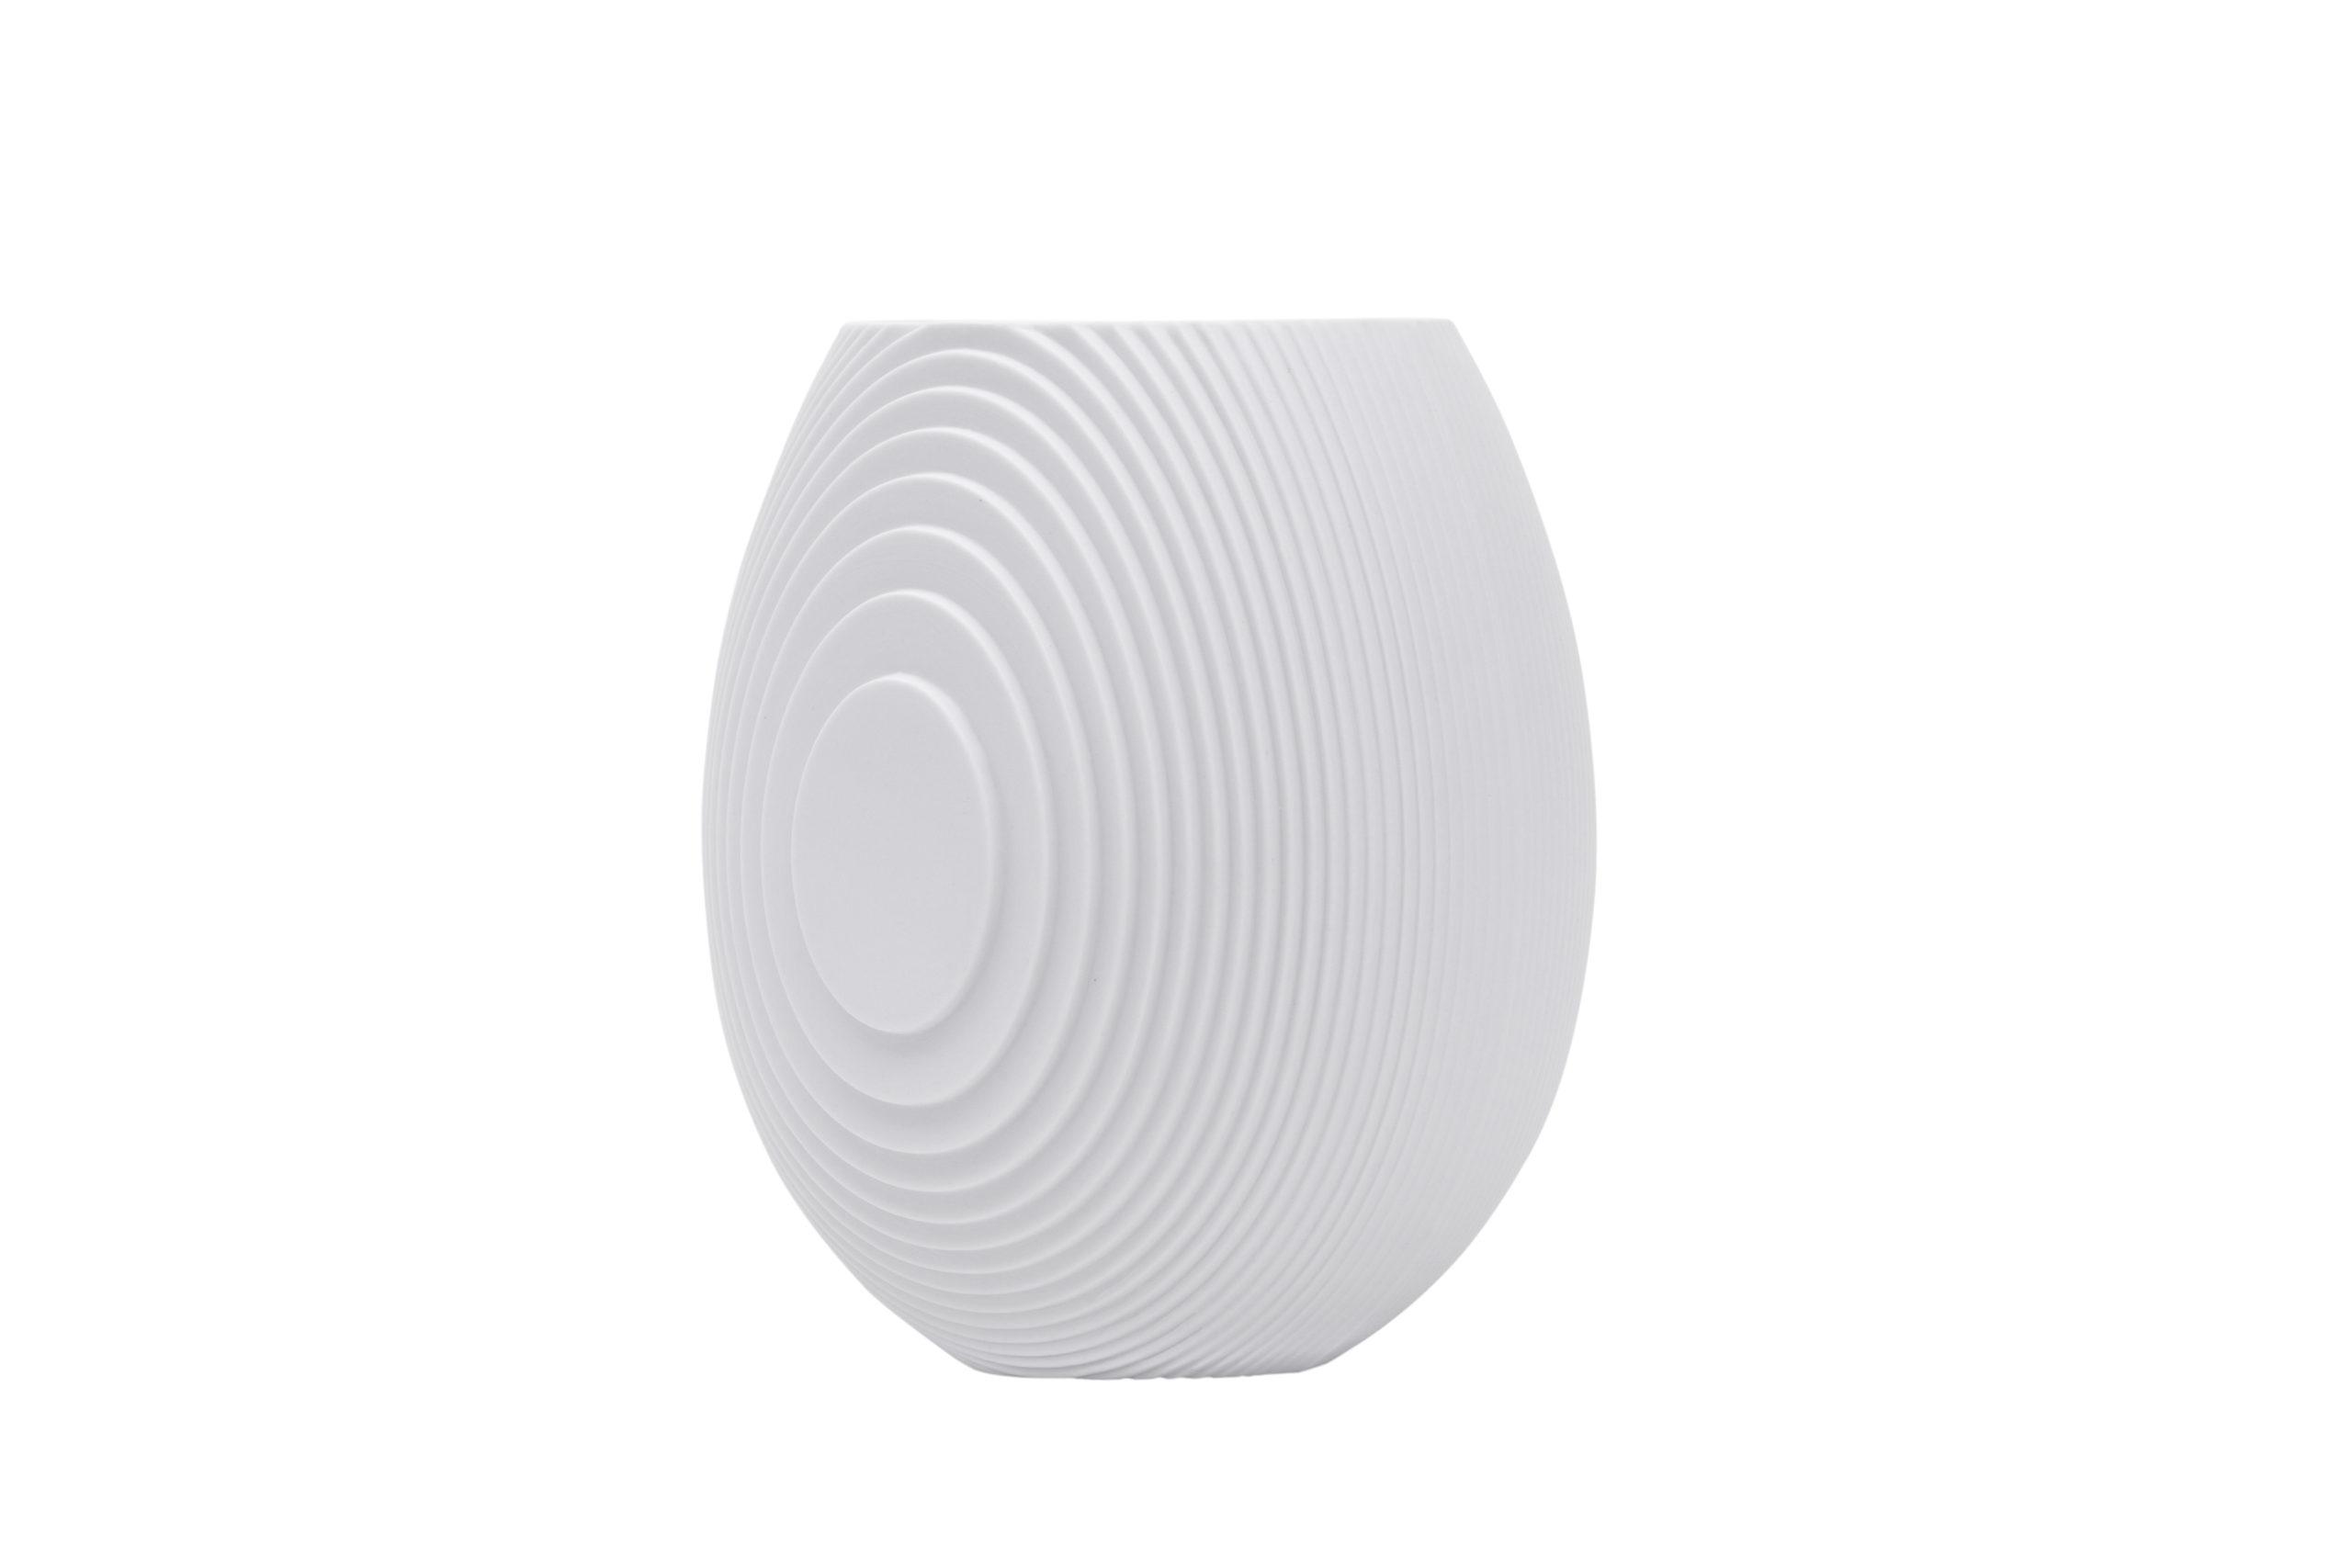 Architectmade-Flow-Bubble-Porcelain-Vibeke-Rytter-2